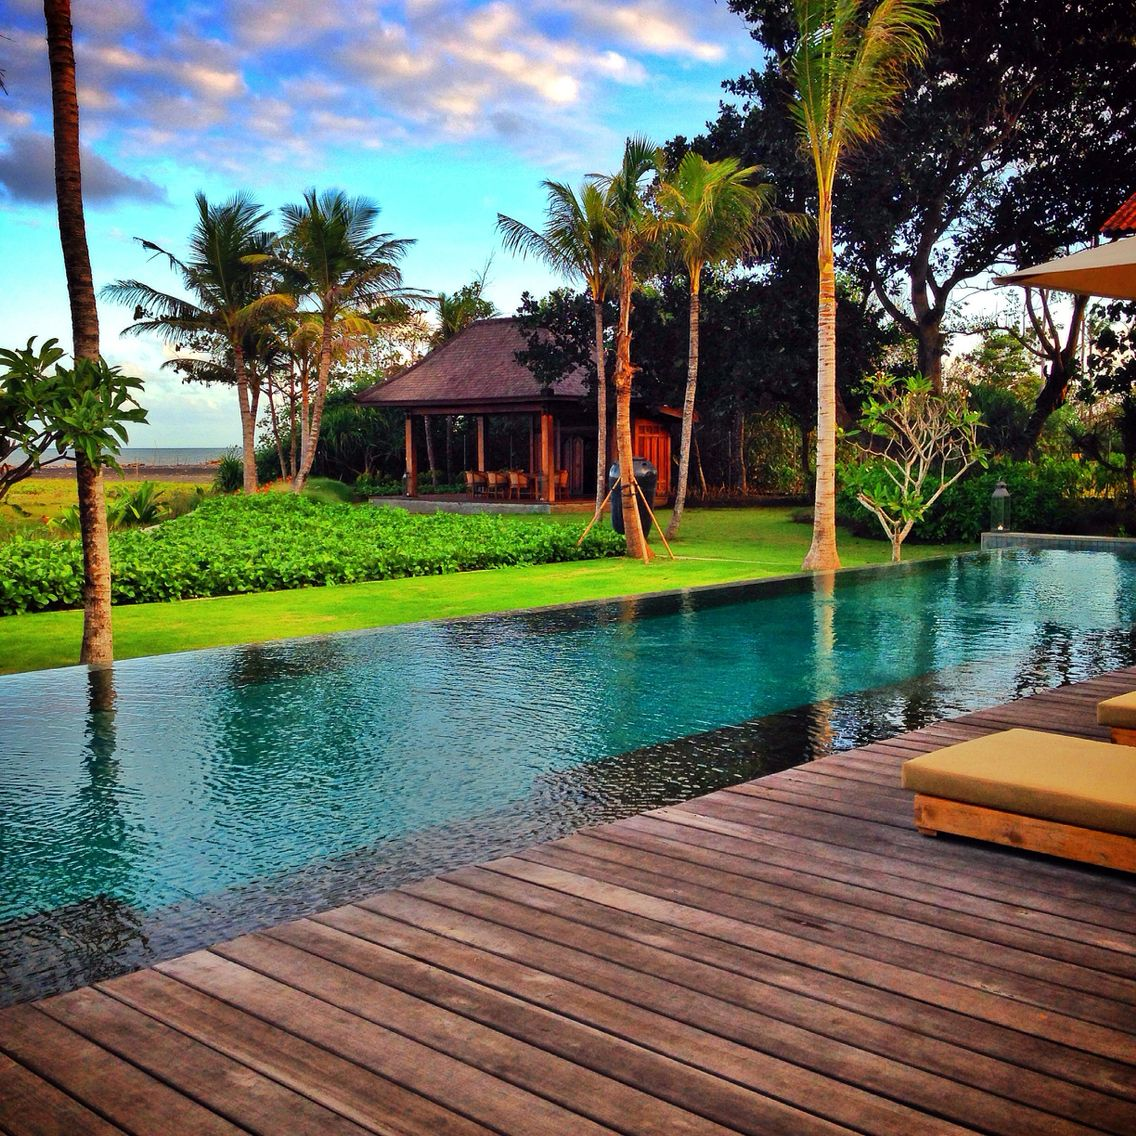 Lush garden at Jeeva Saba Resort, Bali | Travel Bali | Pinterest ...